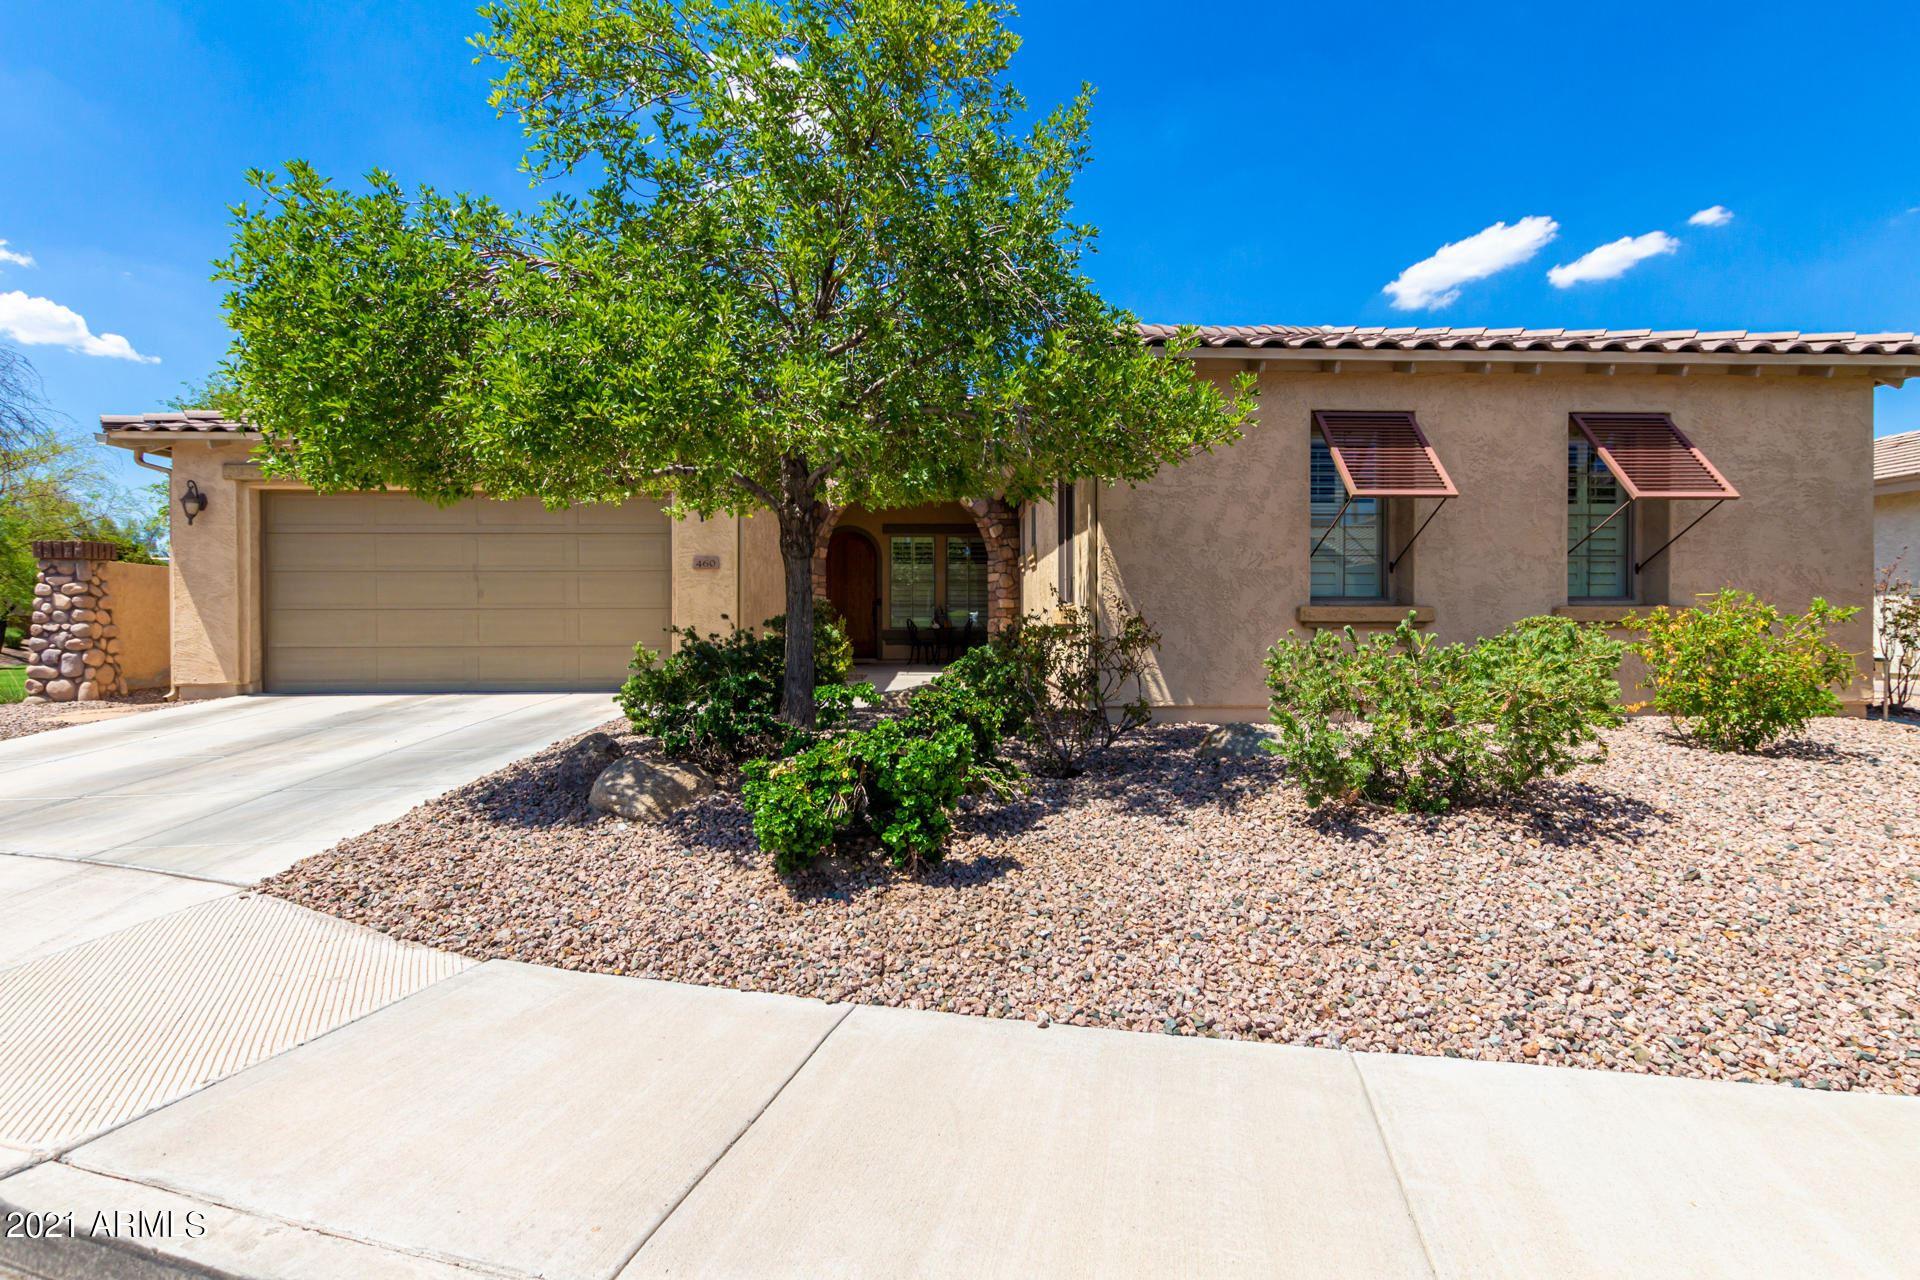 460 W HACKBERRY Drive, Chandler, AZ 85248 - MLS#: 6262025